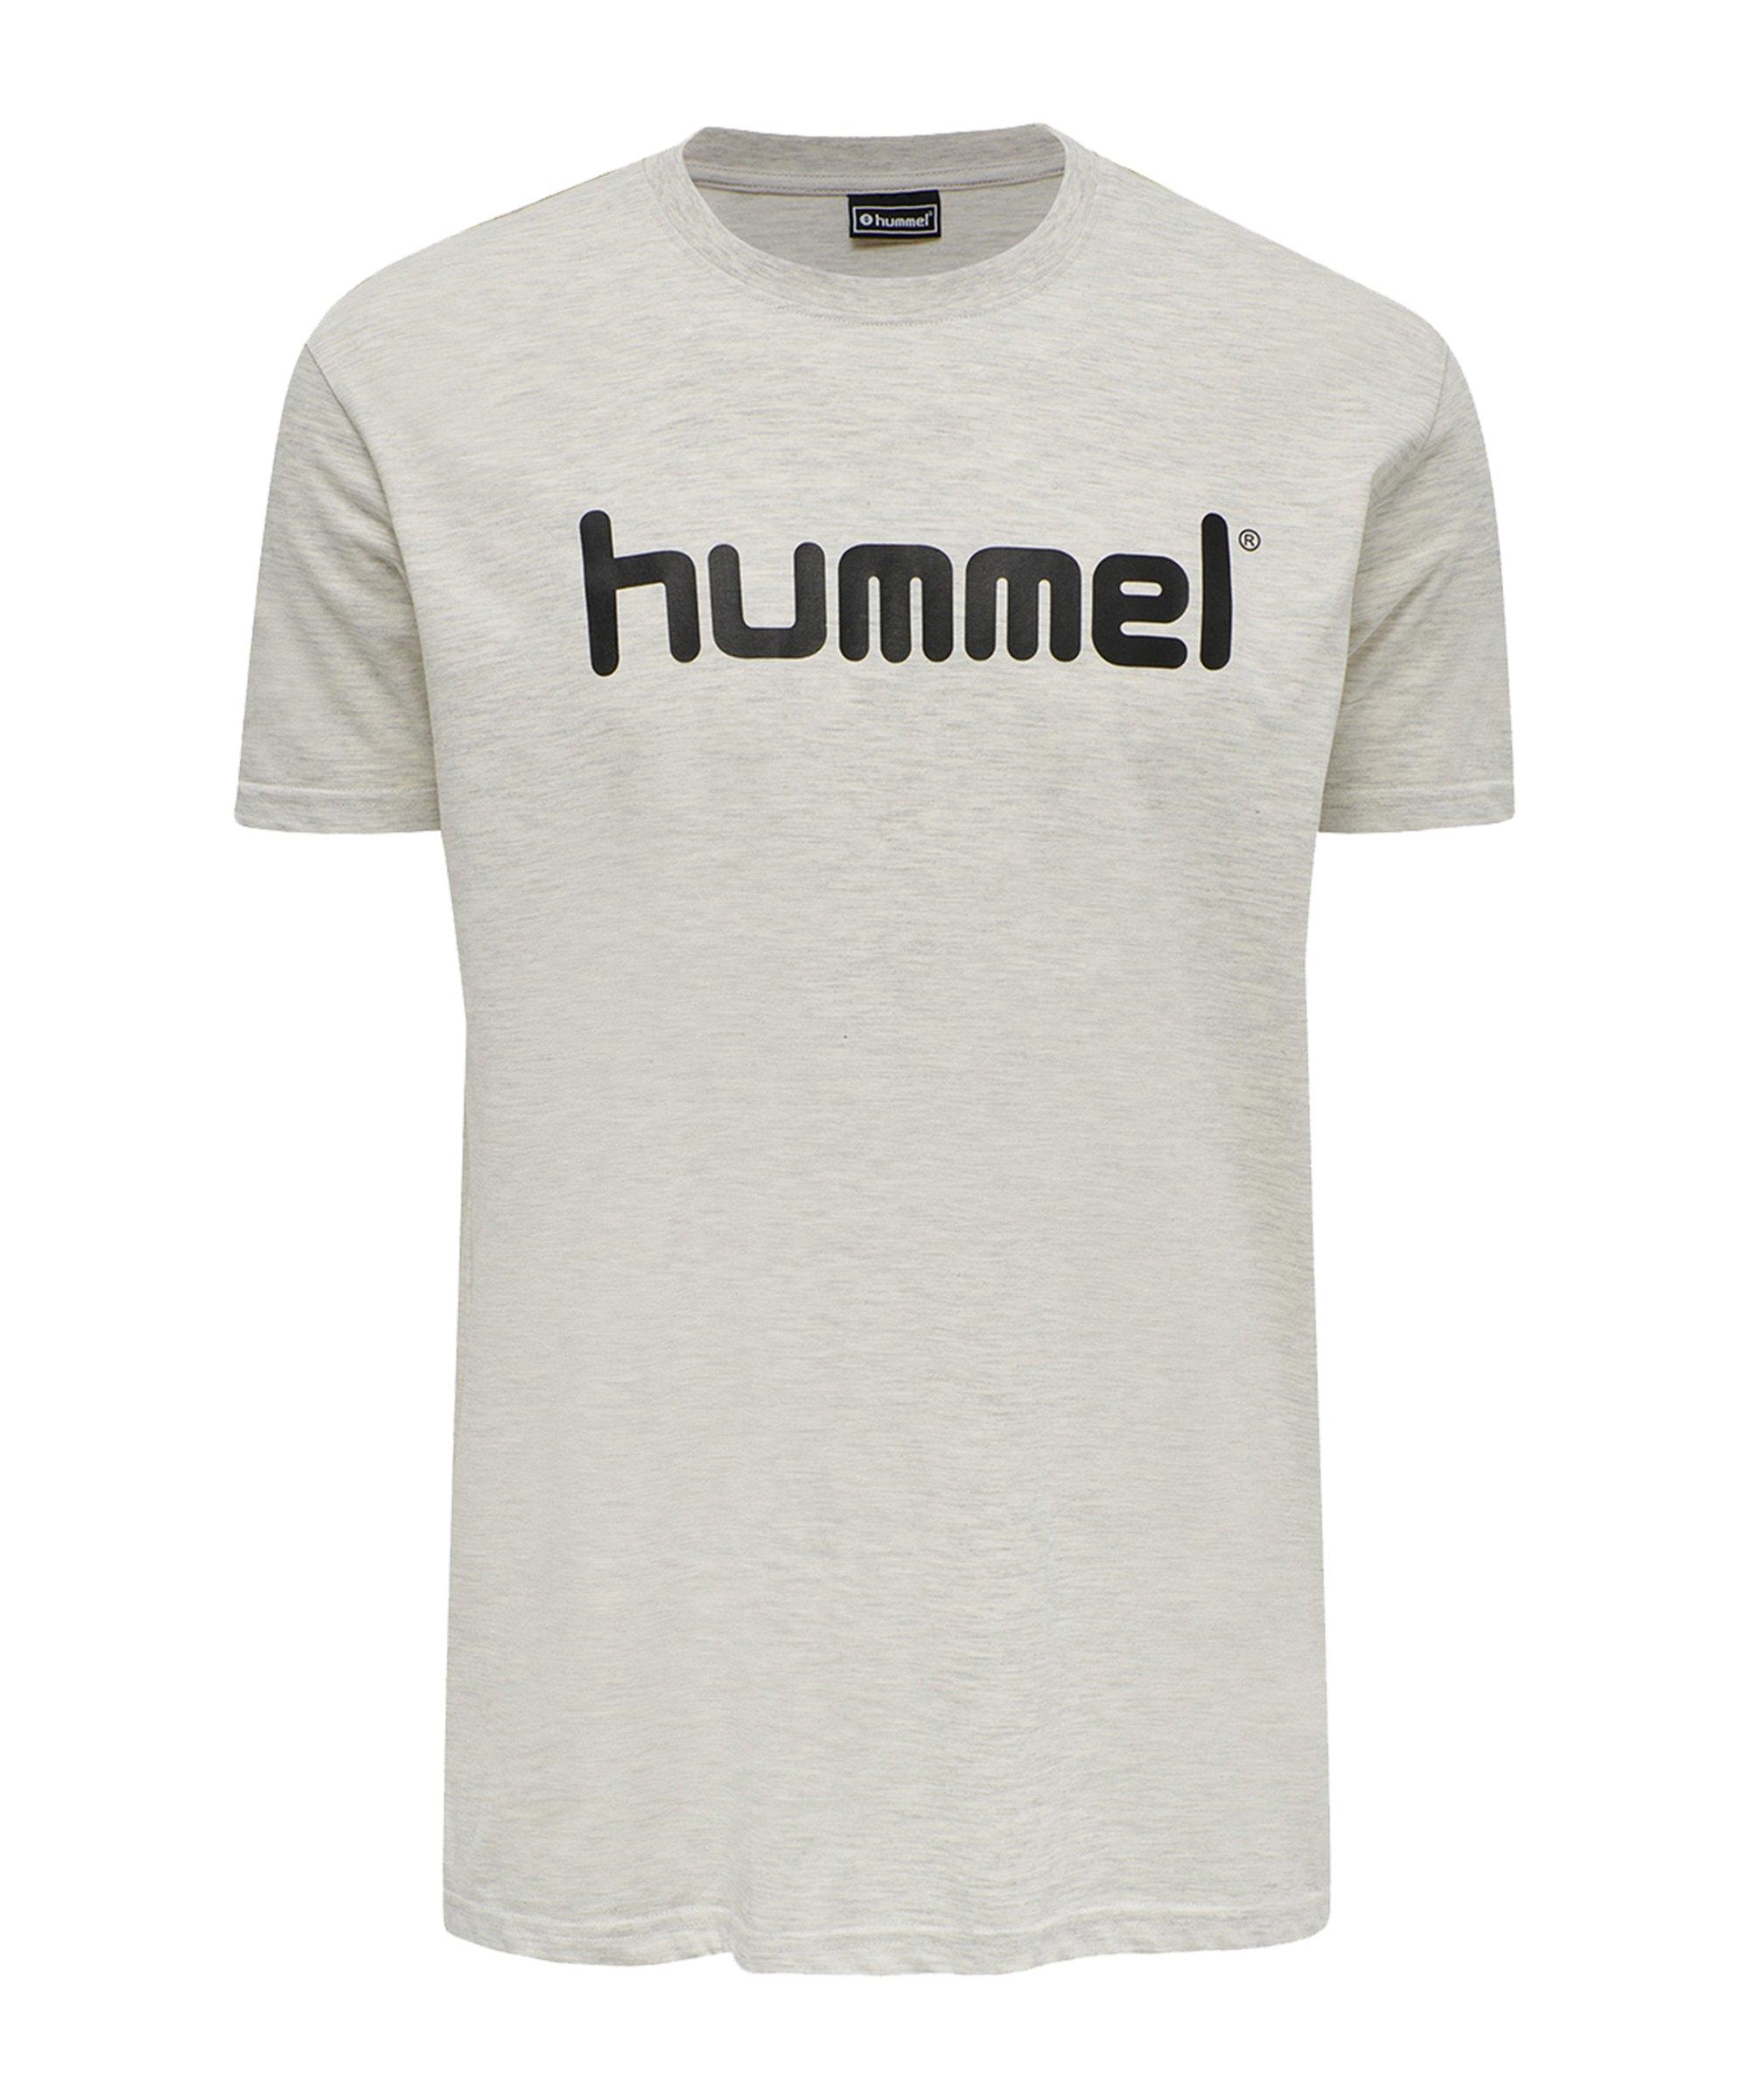 Hummel Cotton T-Shirt Logo Beige F9158 - beige